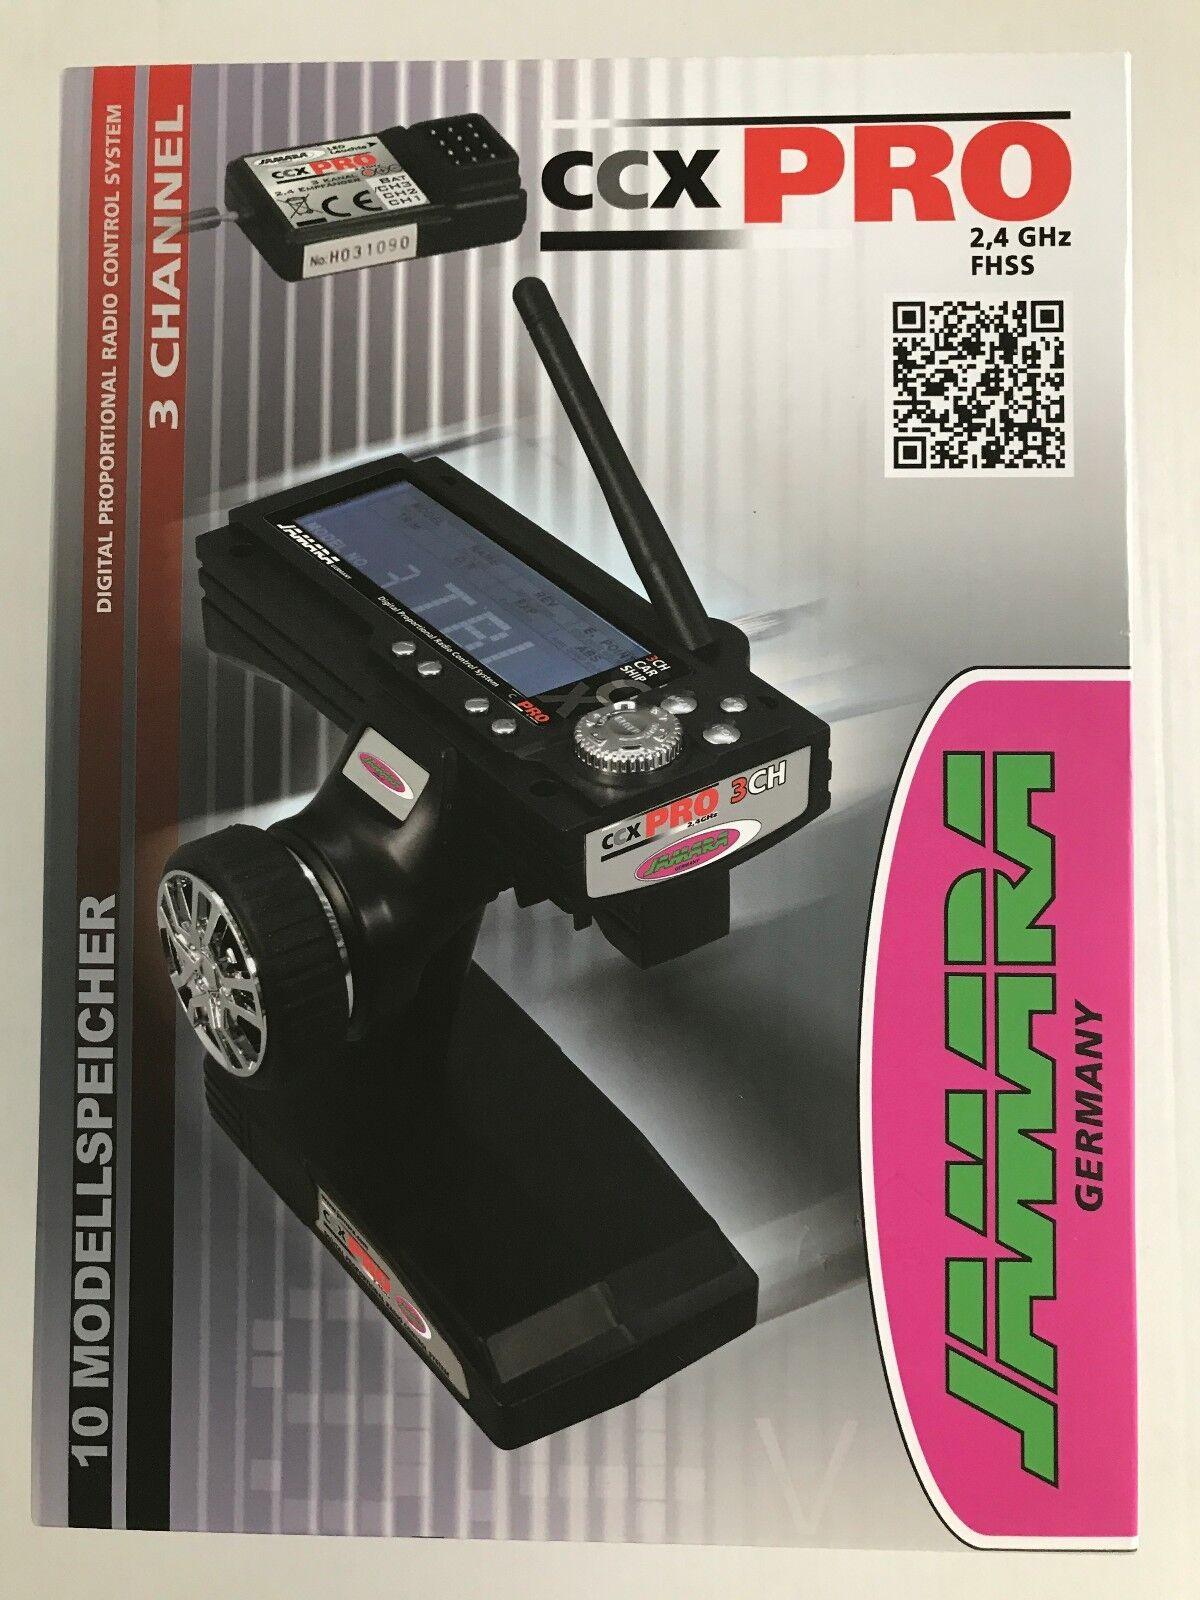 +++ Jamara CAR telecomando CCX 2,4 Pro 2,4ghz Set 3 canali 061200